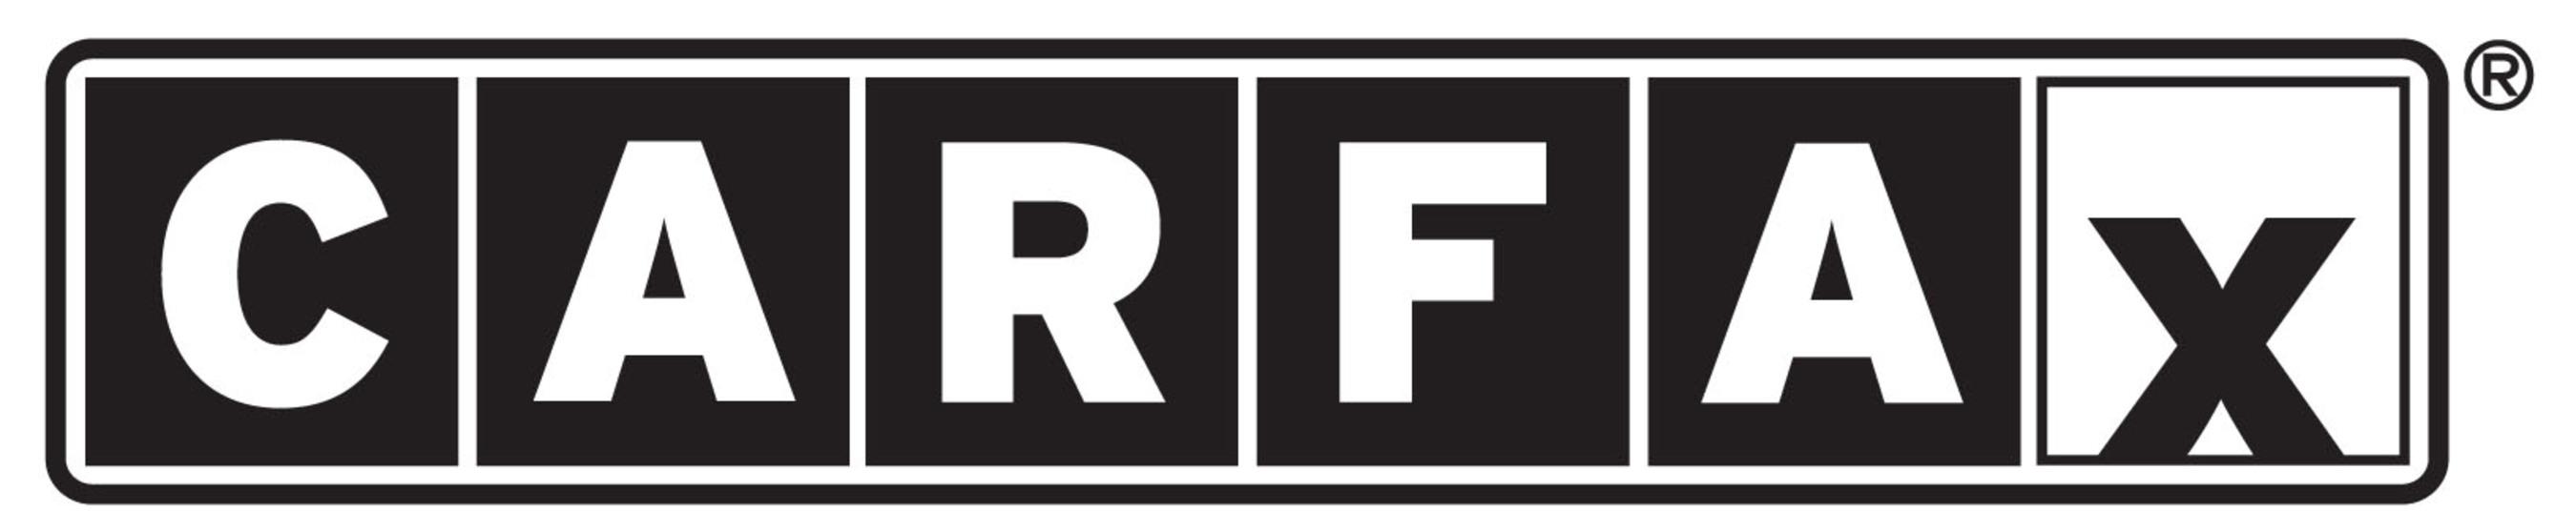 Carfax logo. (PRNewsFoto/Carfax) (PRNewsFoto/)